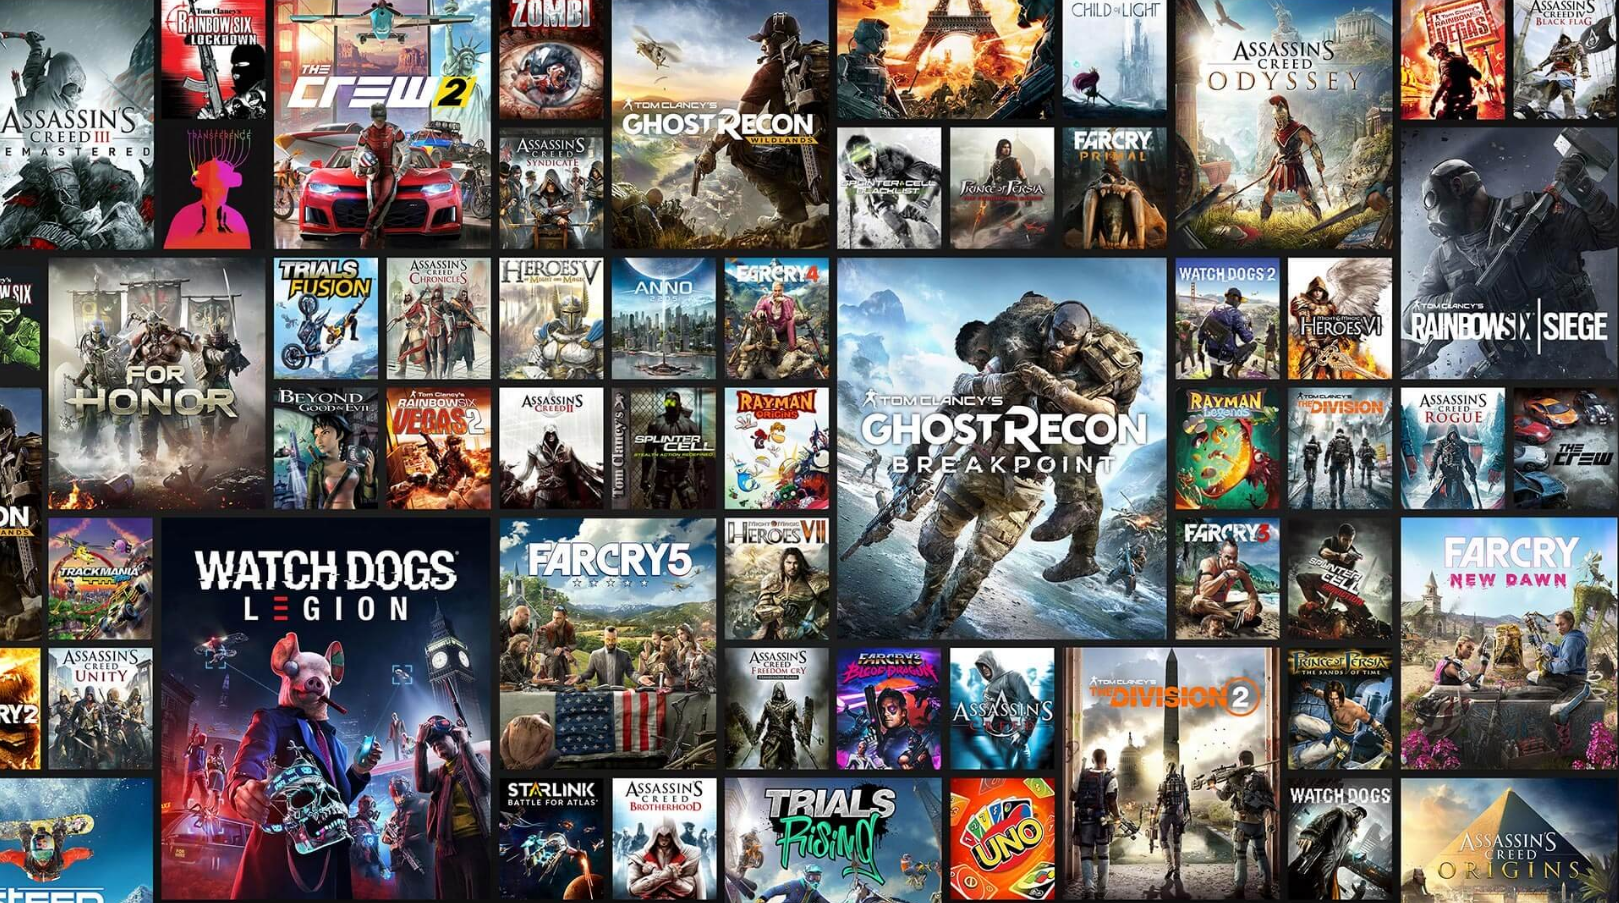 Ubisoft теряет прибыль, норада успехам Assassin'sCreed иRainbow Six Siege: главное изотчета компании